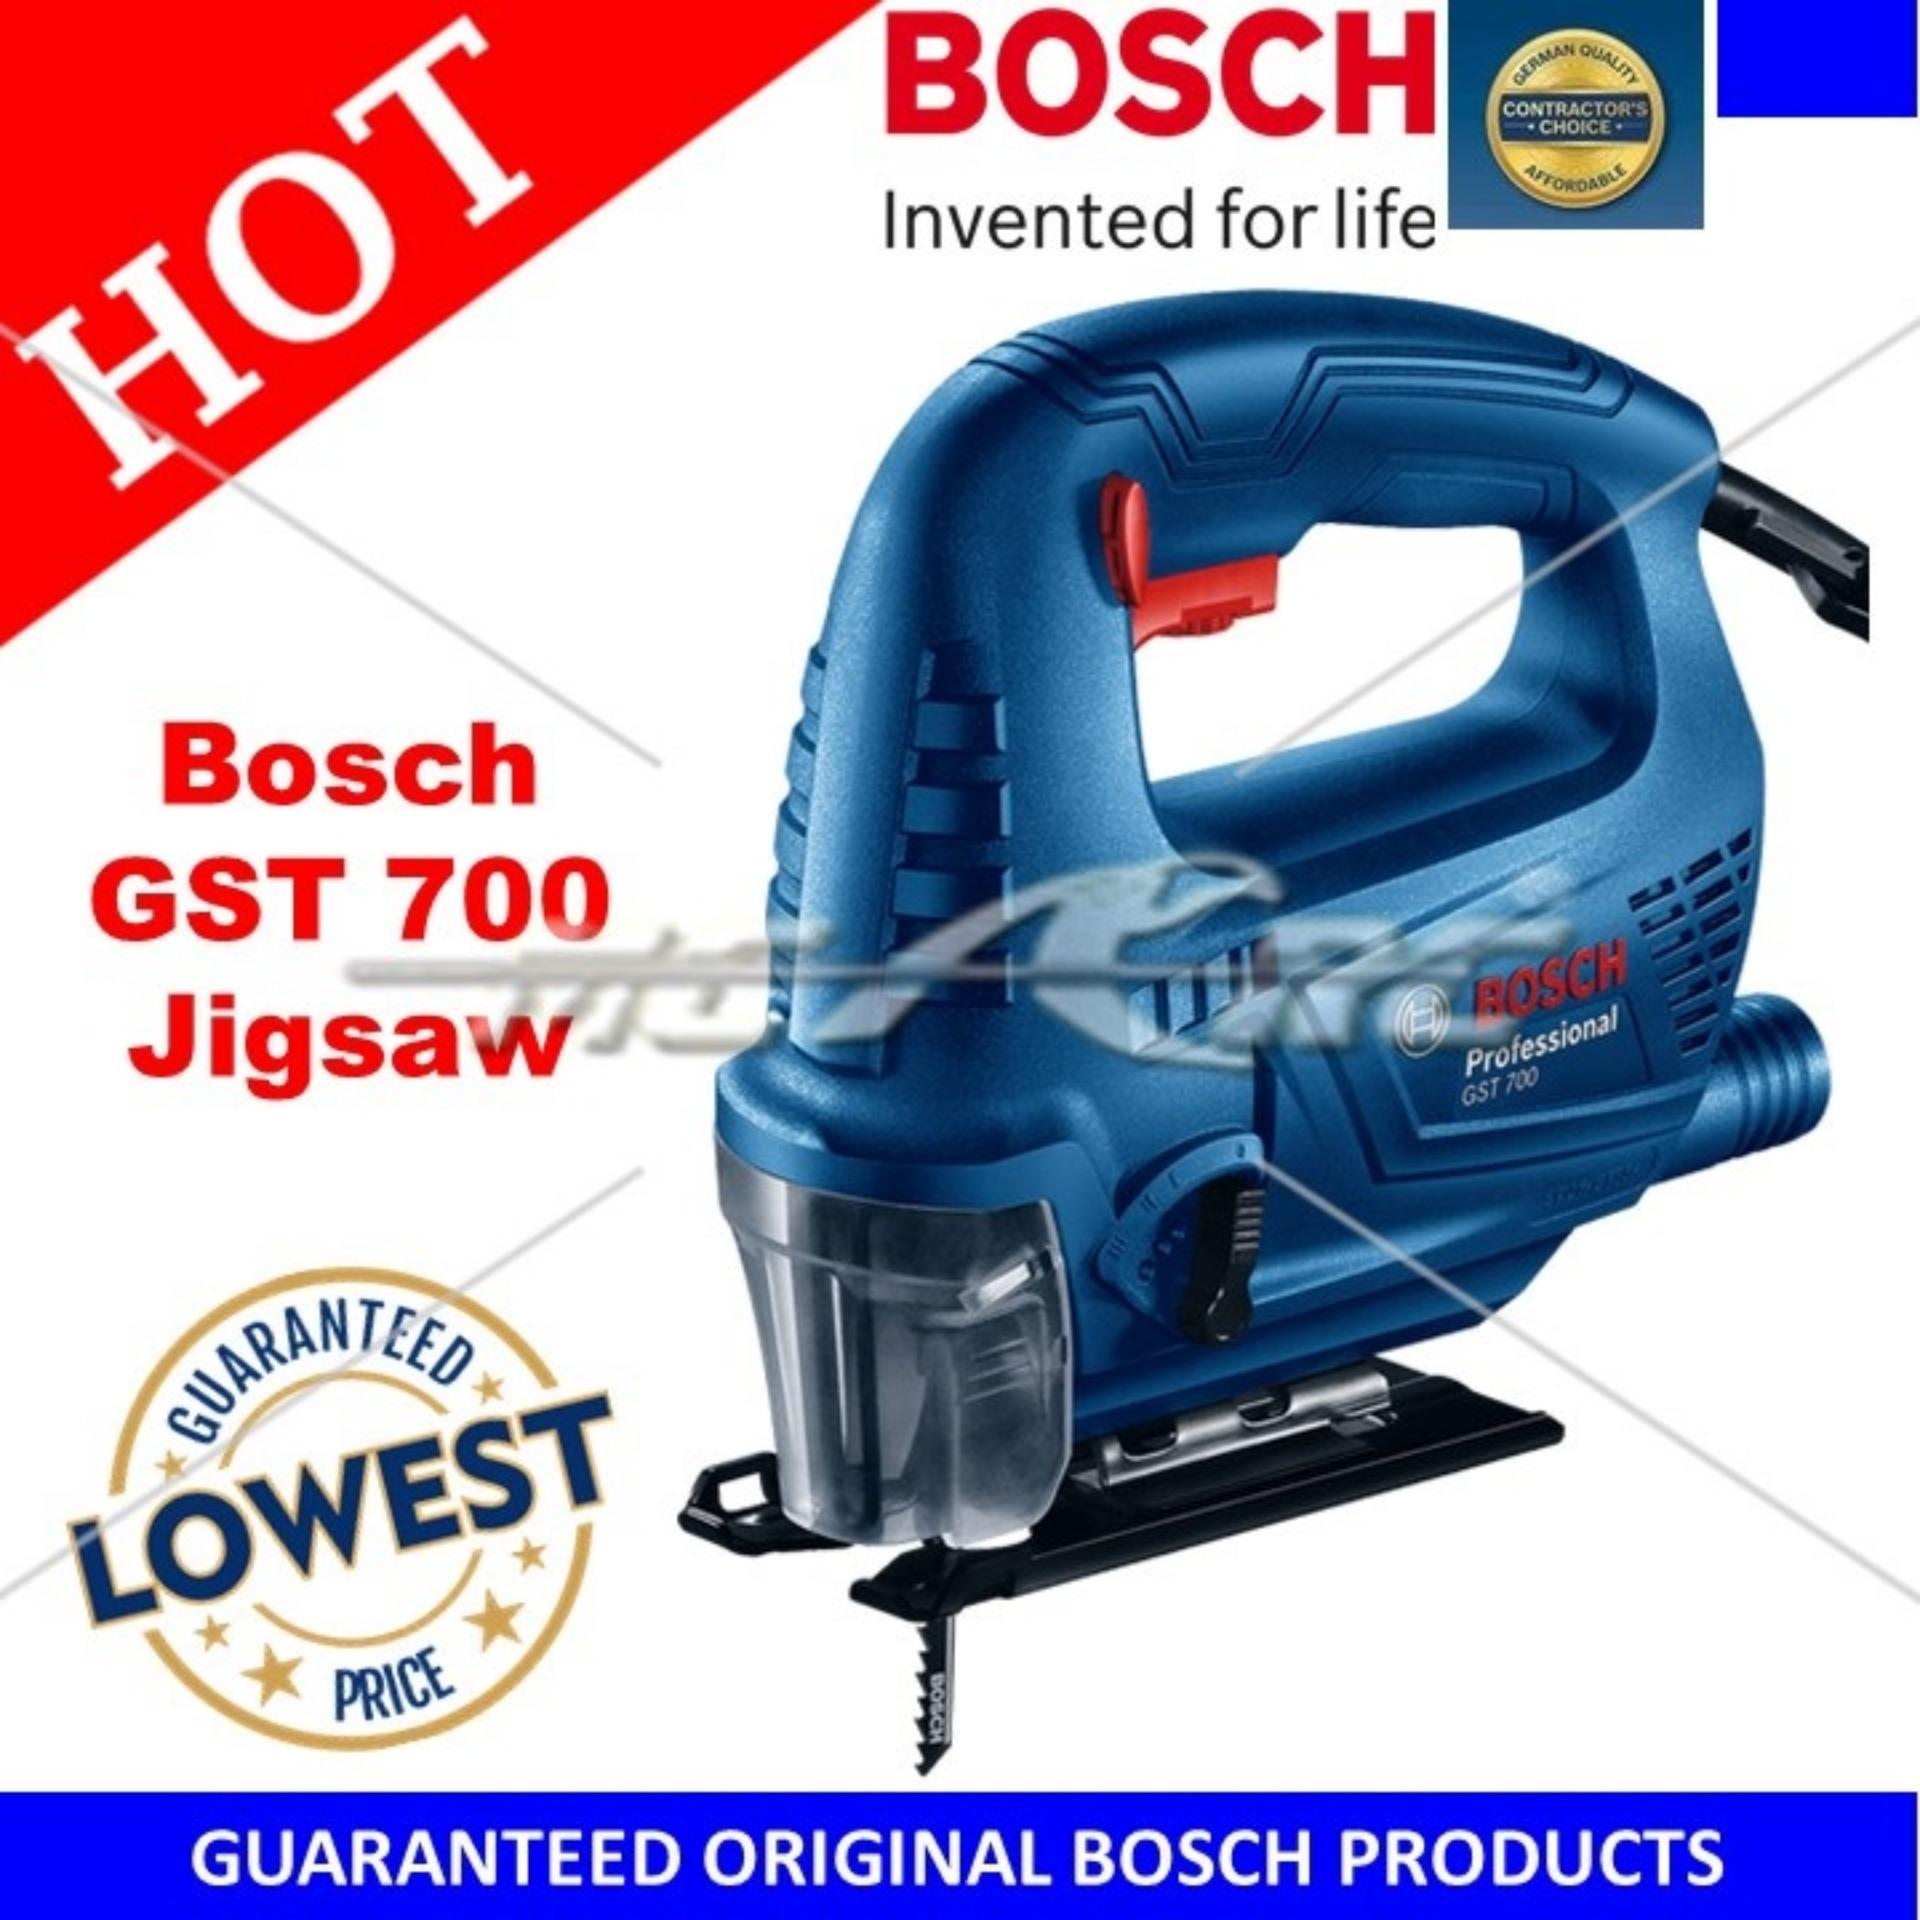 Bosch Jigsaw Gst 80 Pb Daftar Harga Terbaru Dan Terlengkap Mesin Gergaji Buy Sell Cheapest 8000e Best Quality Product Deals Philippines Store